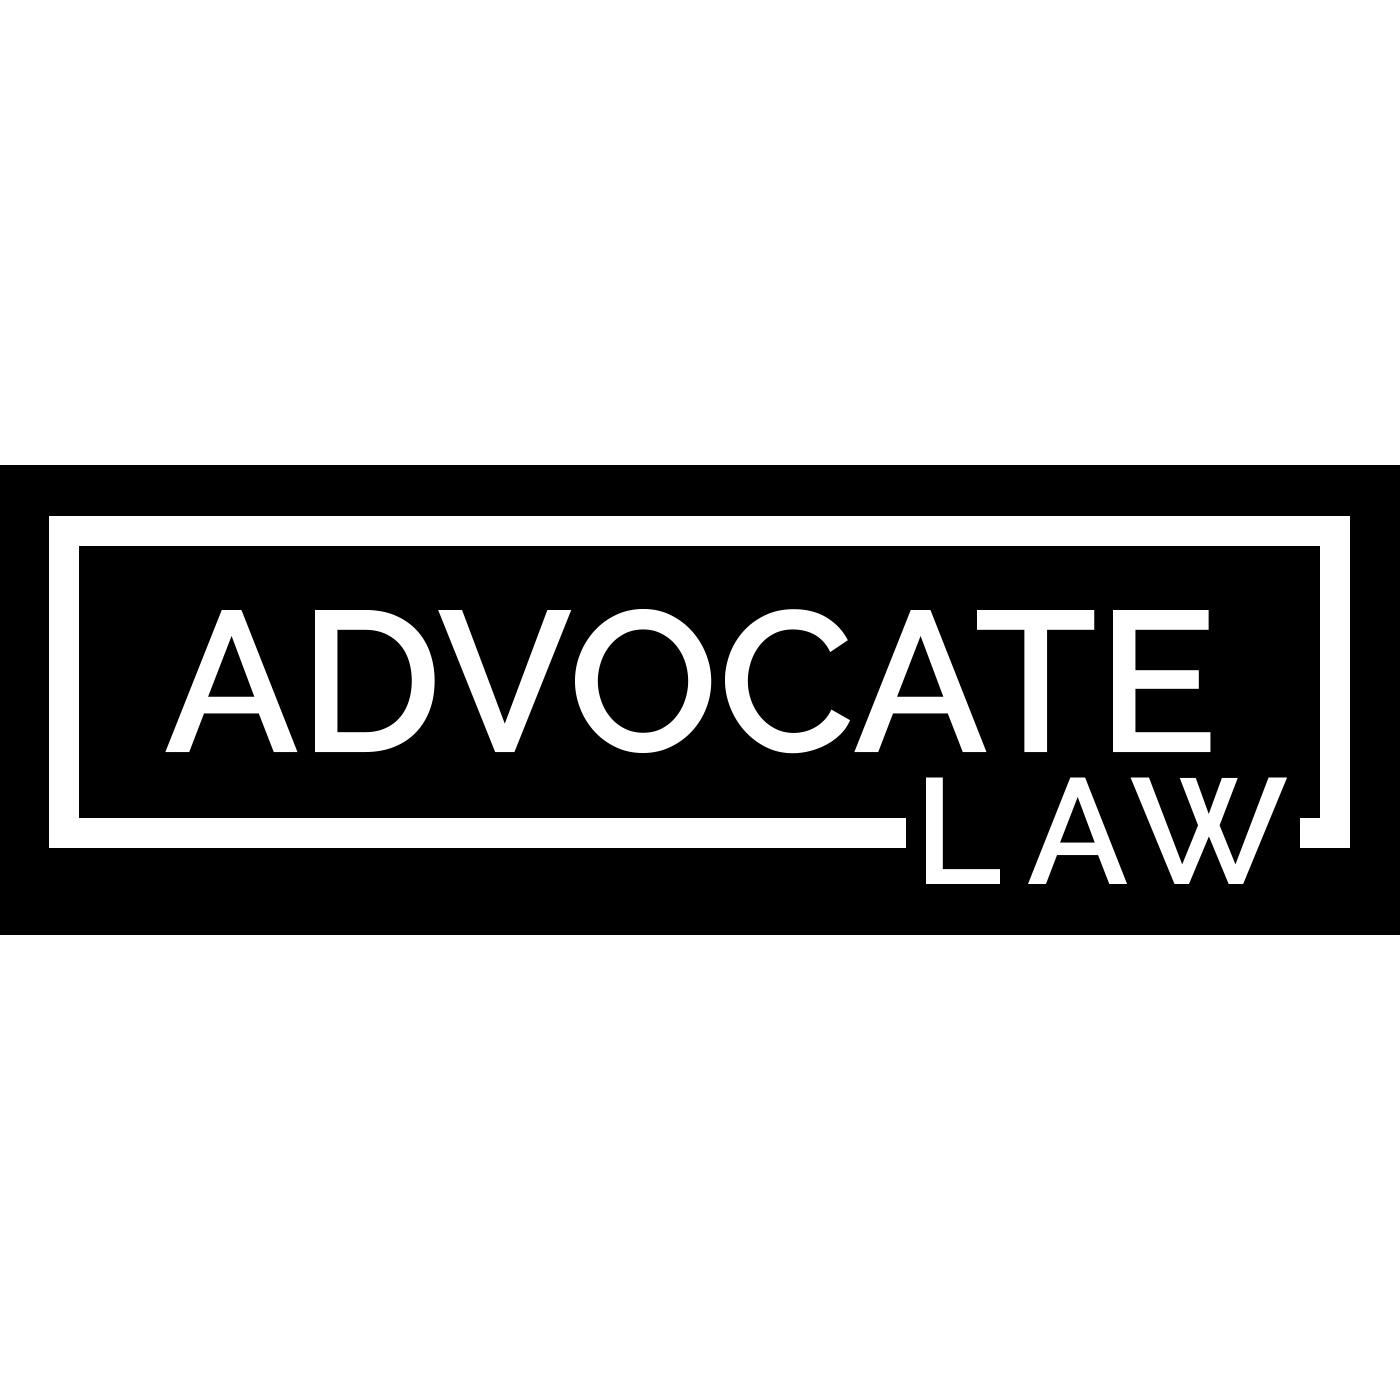 Advocate Law